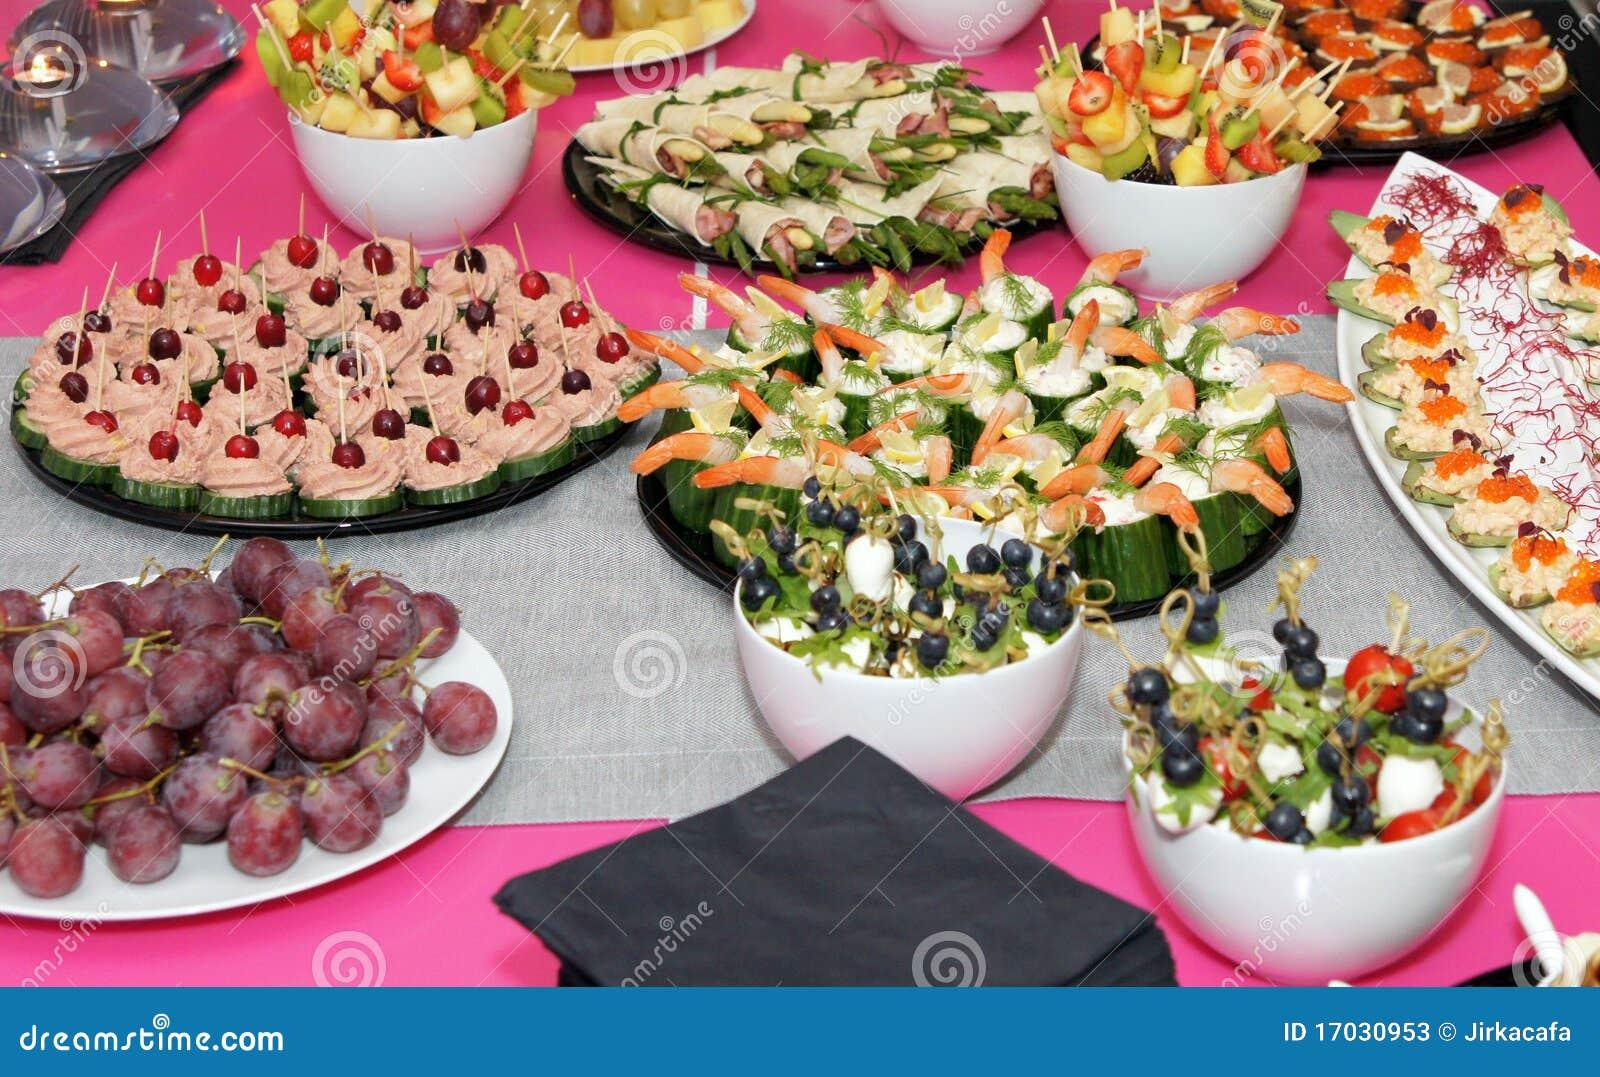 Banquet appetizing food